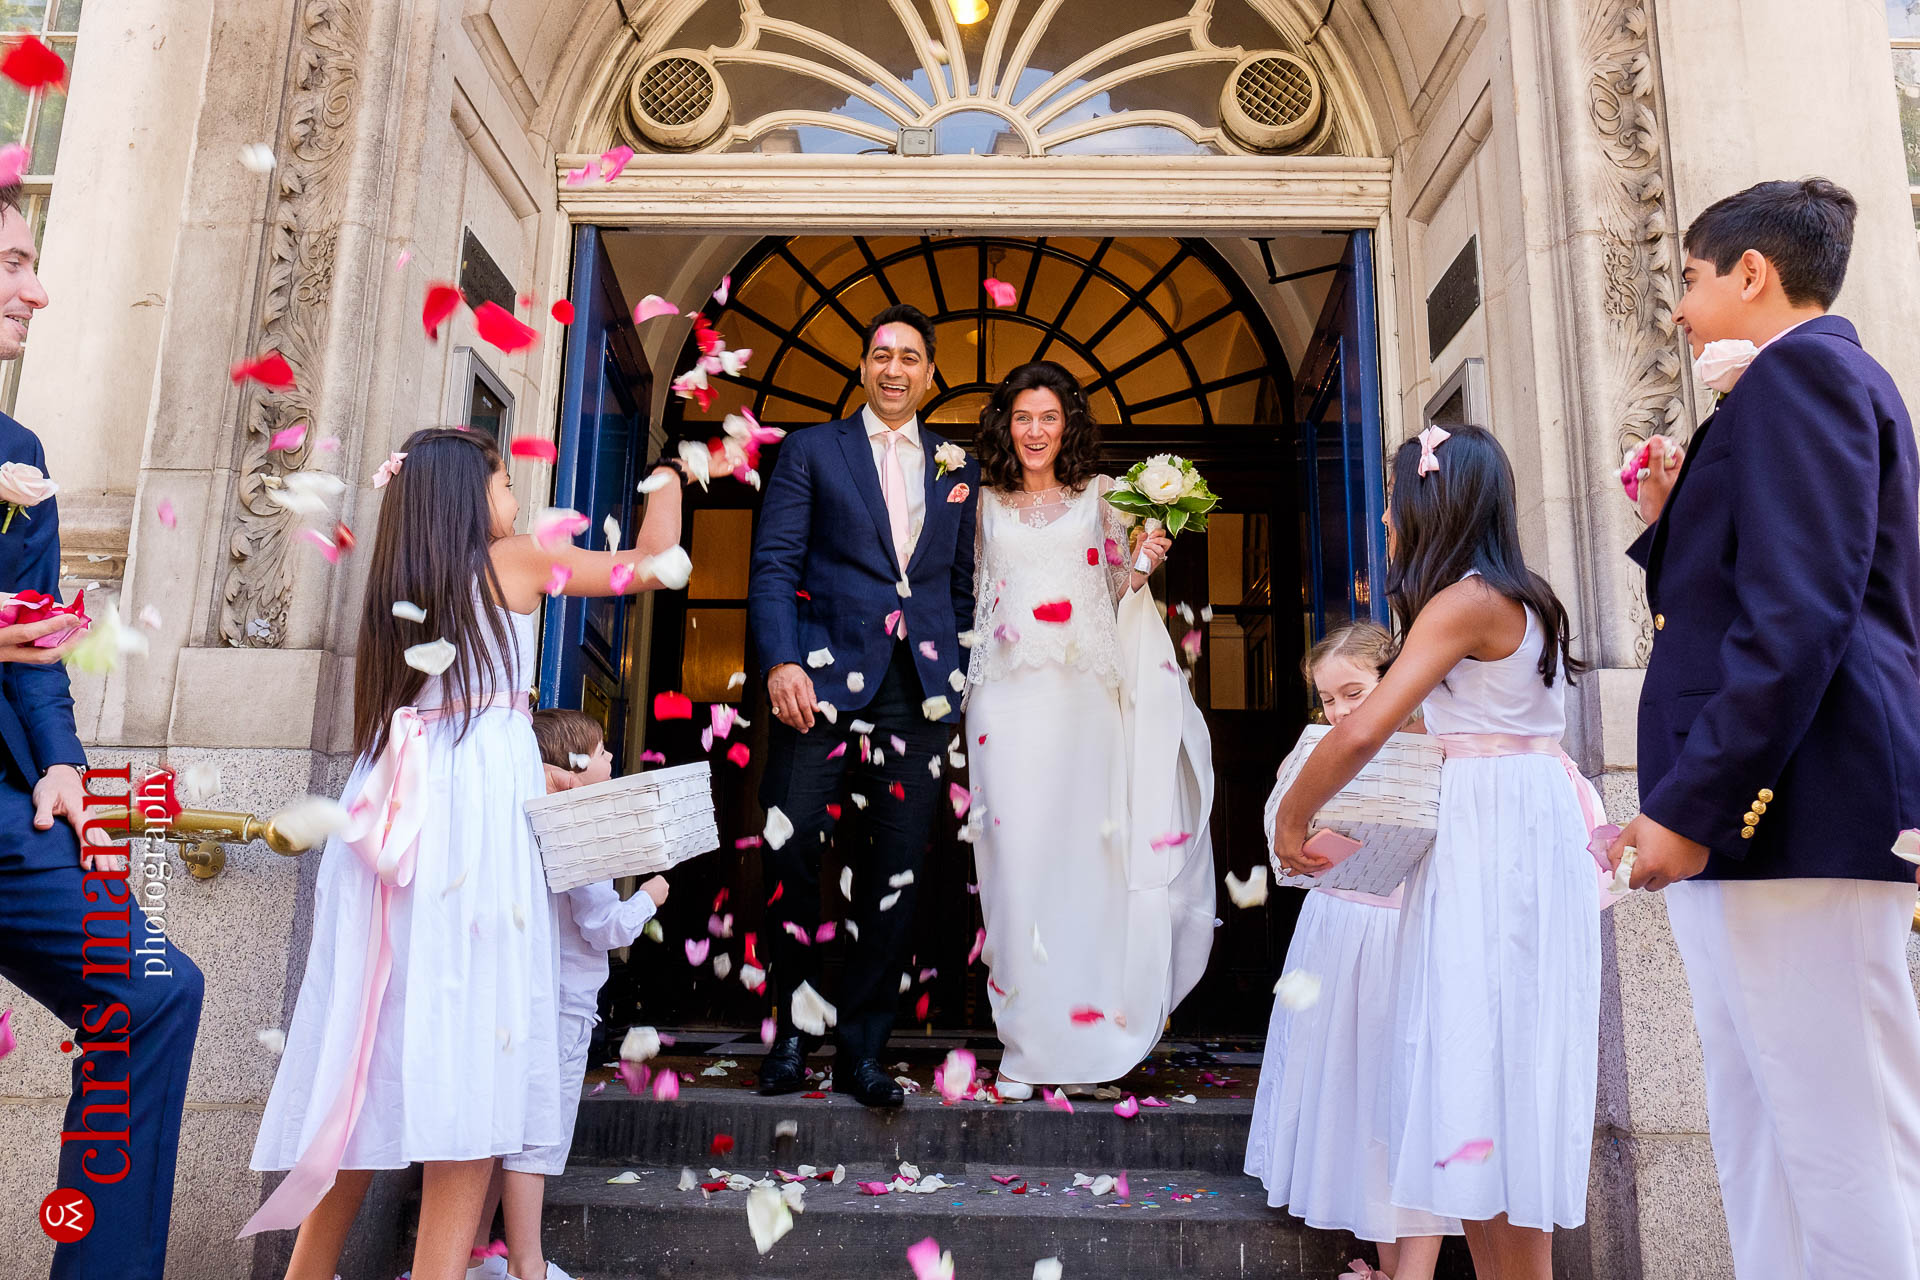 confetti toss on the steps outside Chelsea Registry Office wedding